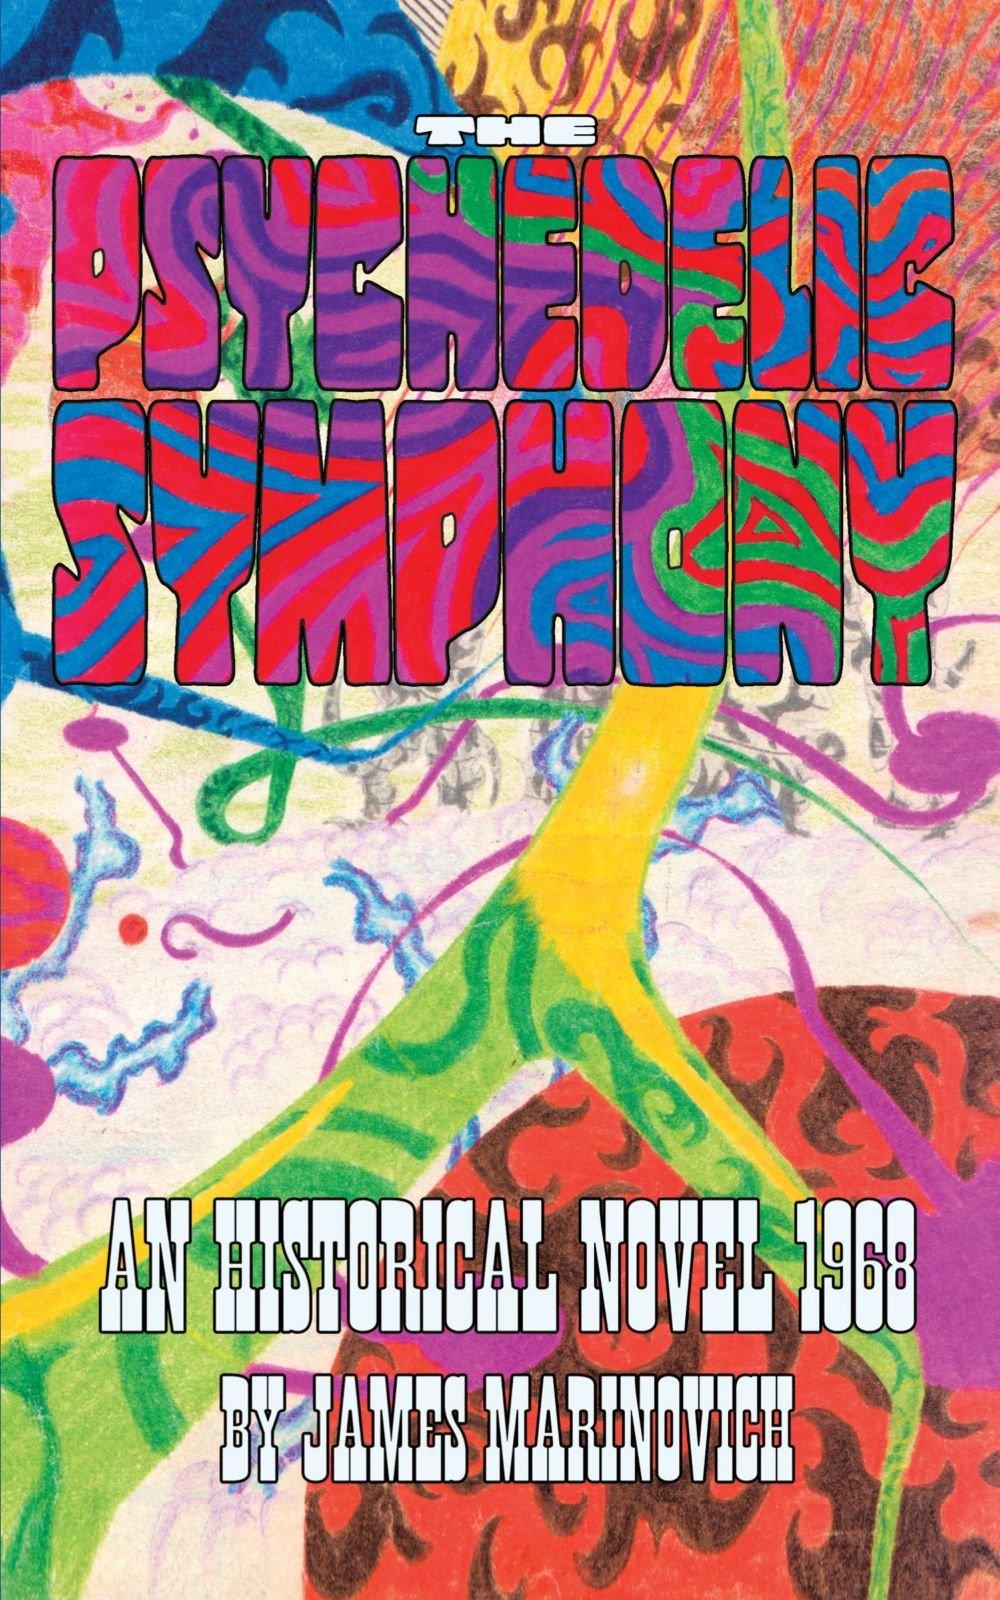 Read Online The Psychedelic Symphony: An Historical Novel 1968 pdf epub